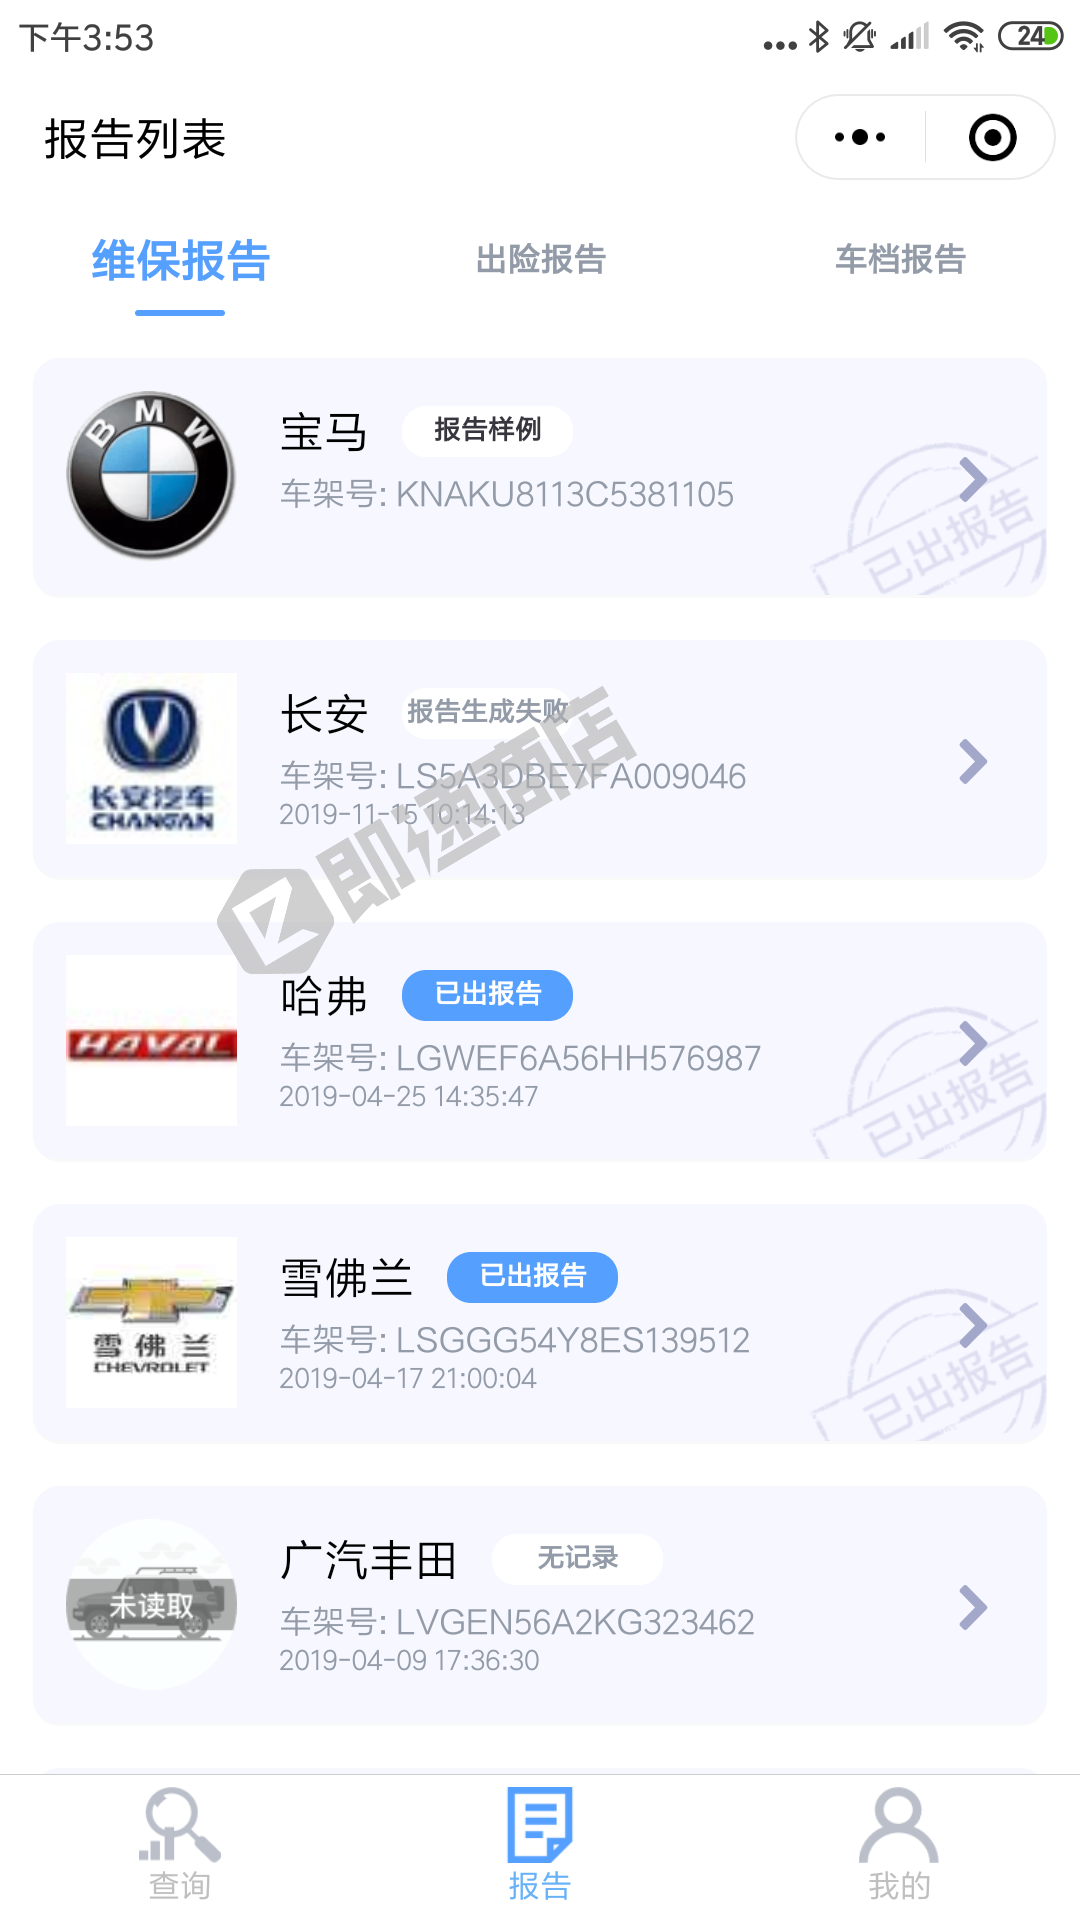 4S汽车维修保养记录查询小程序列表页截图